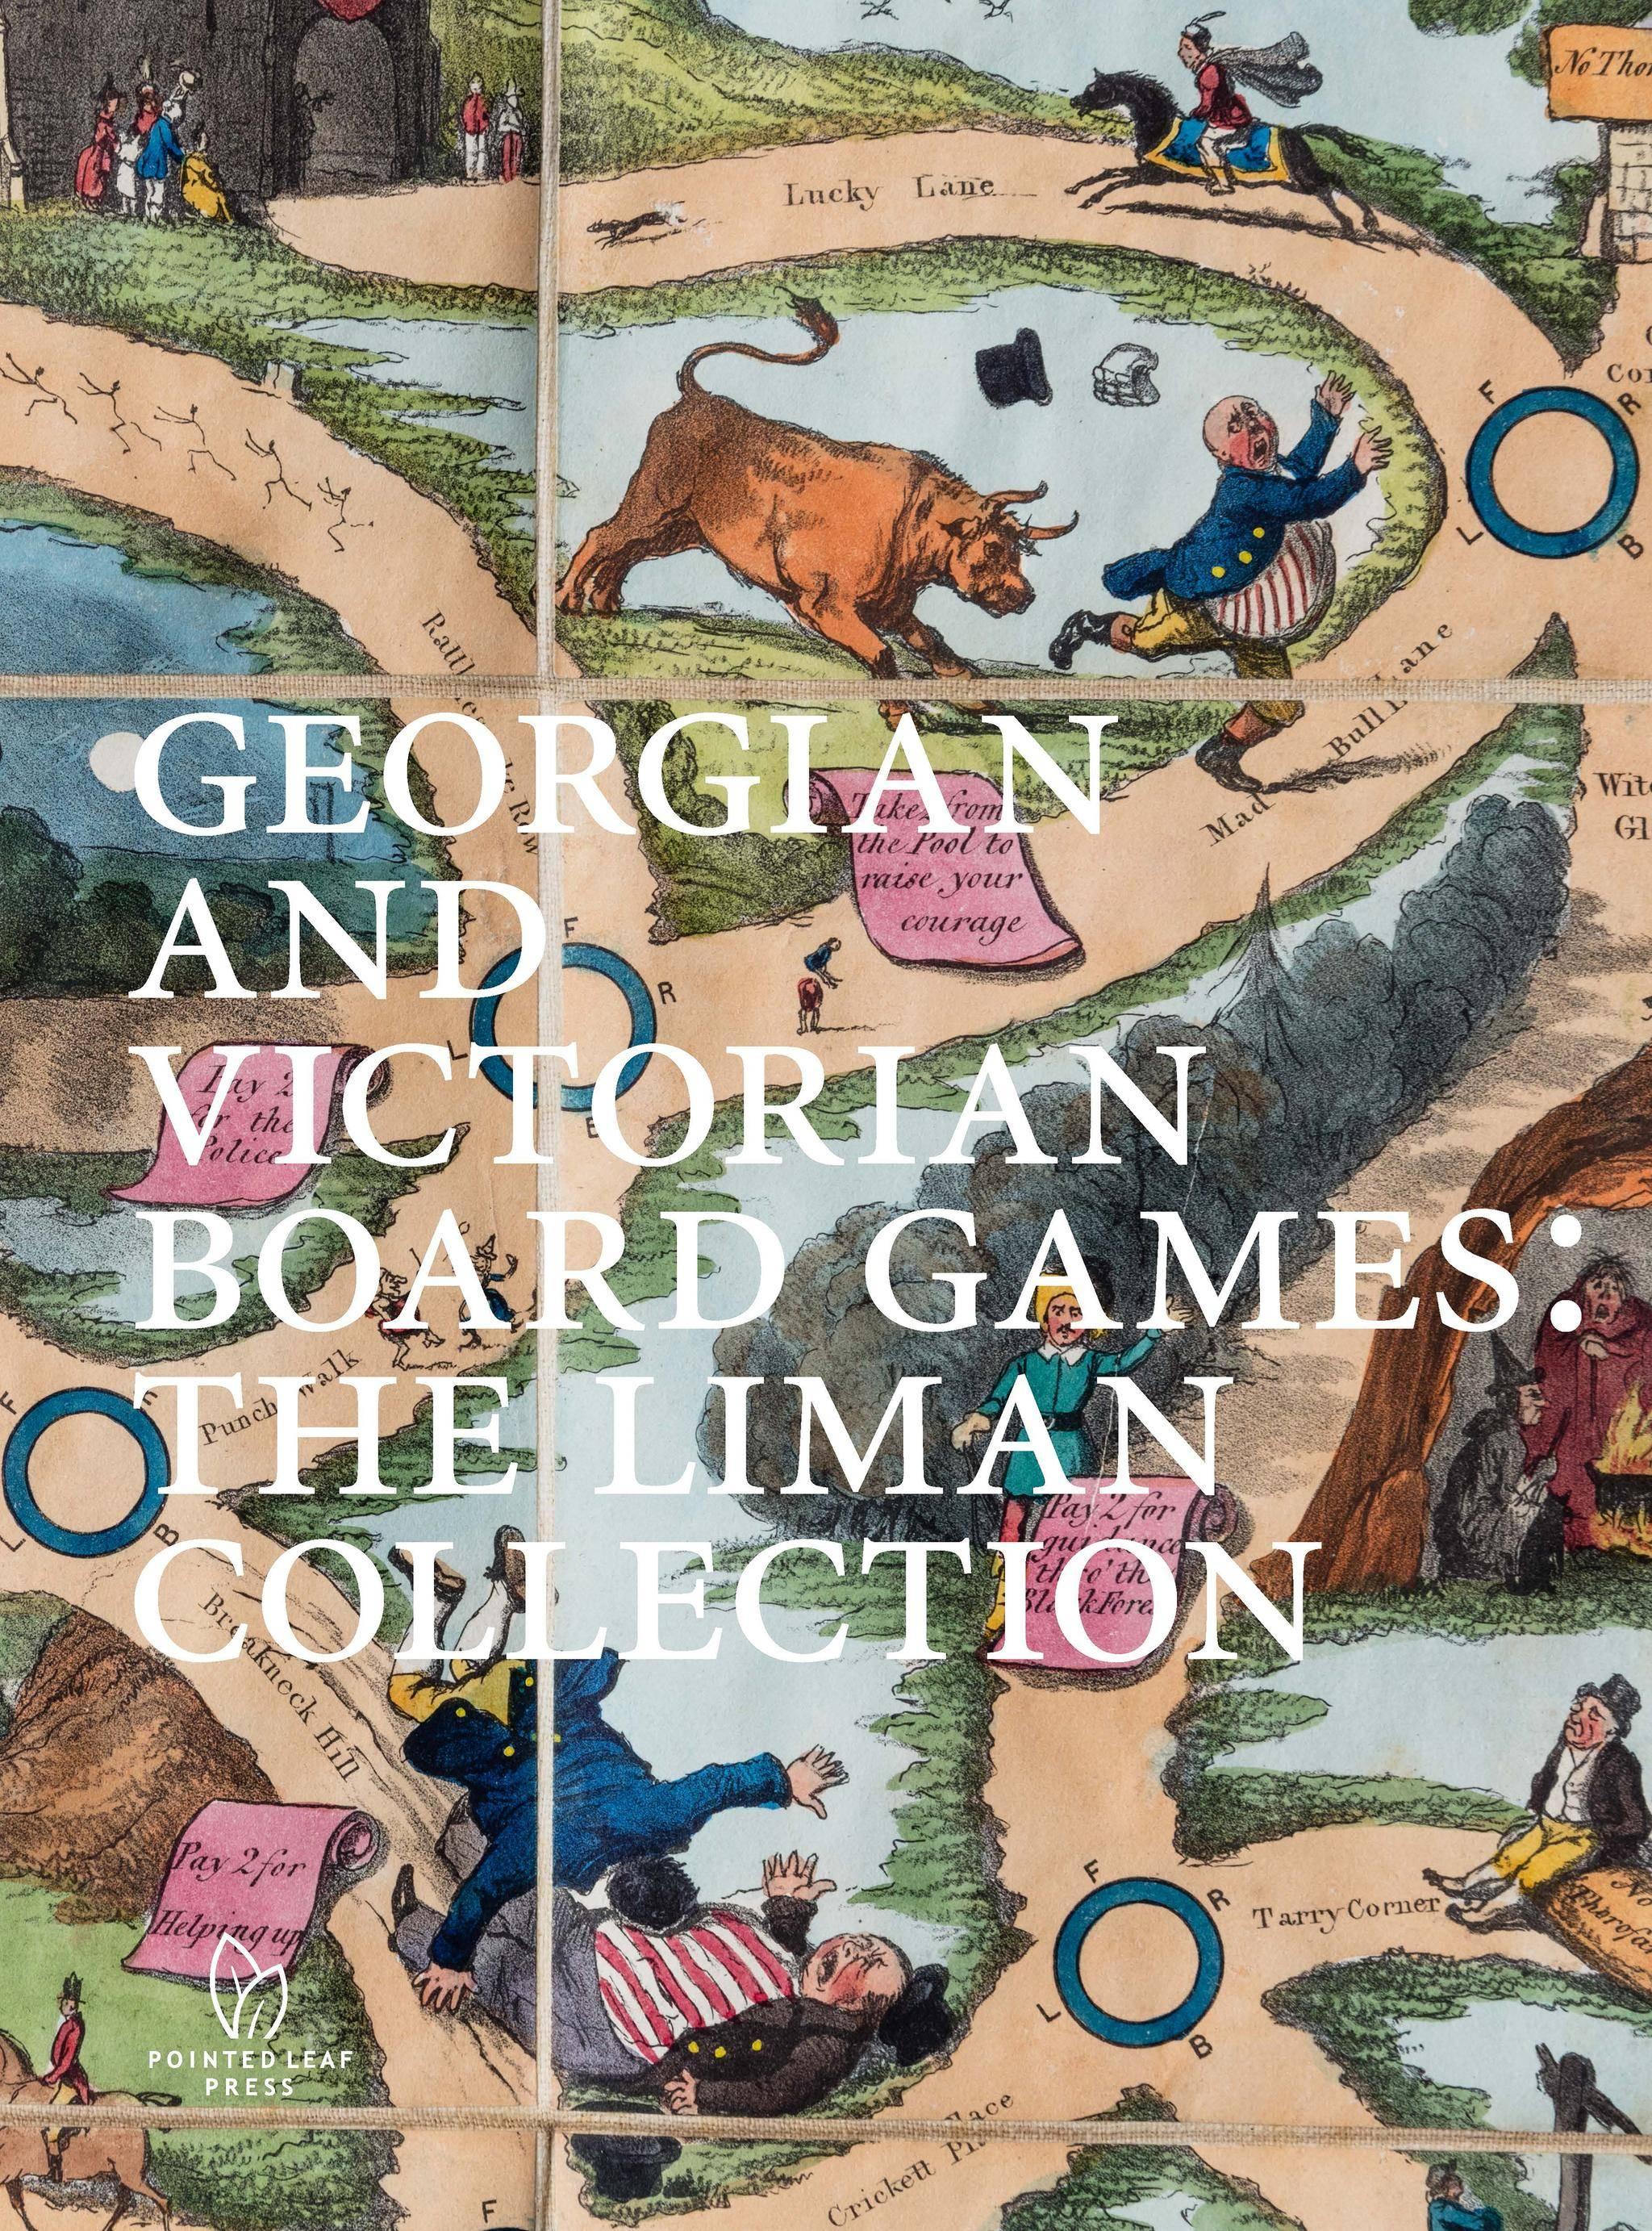 georgian and victorian board games 1